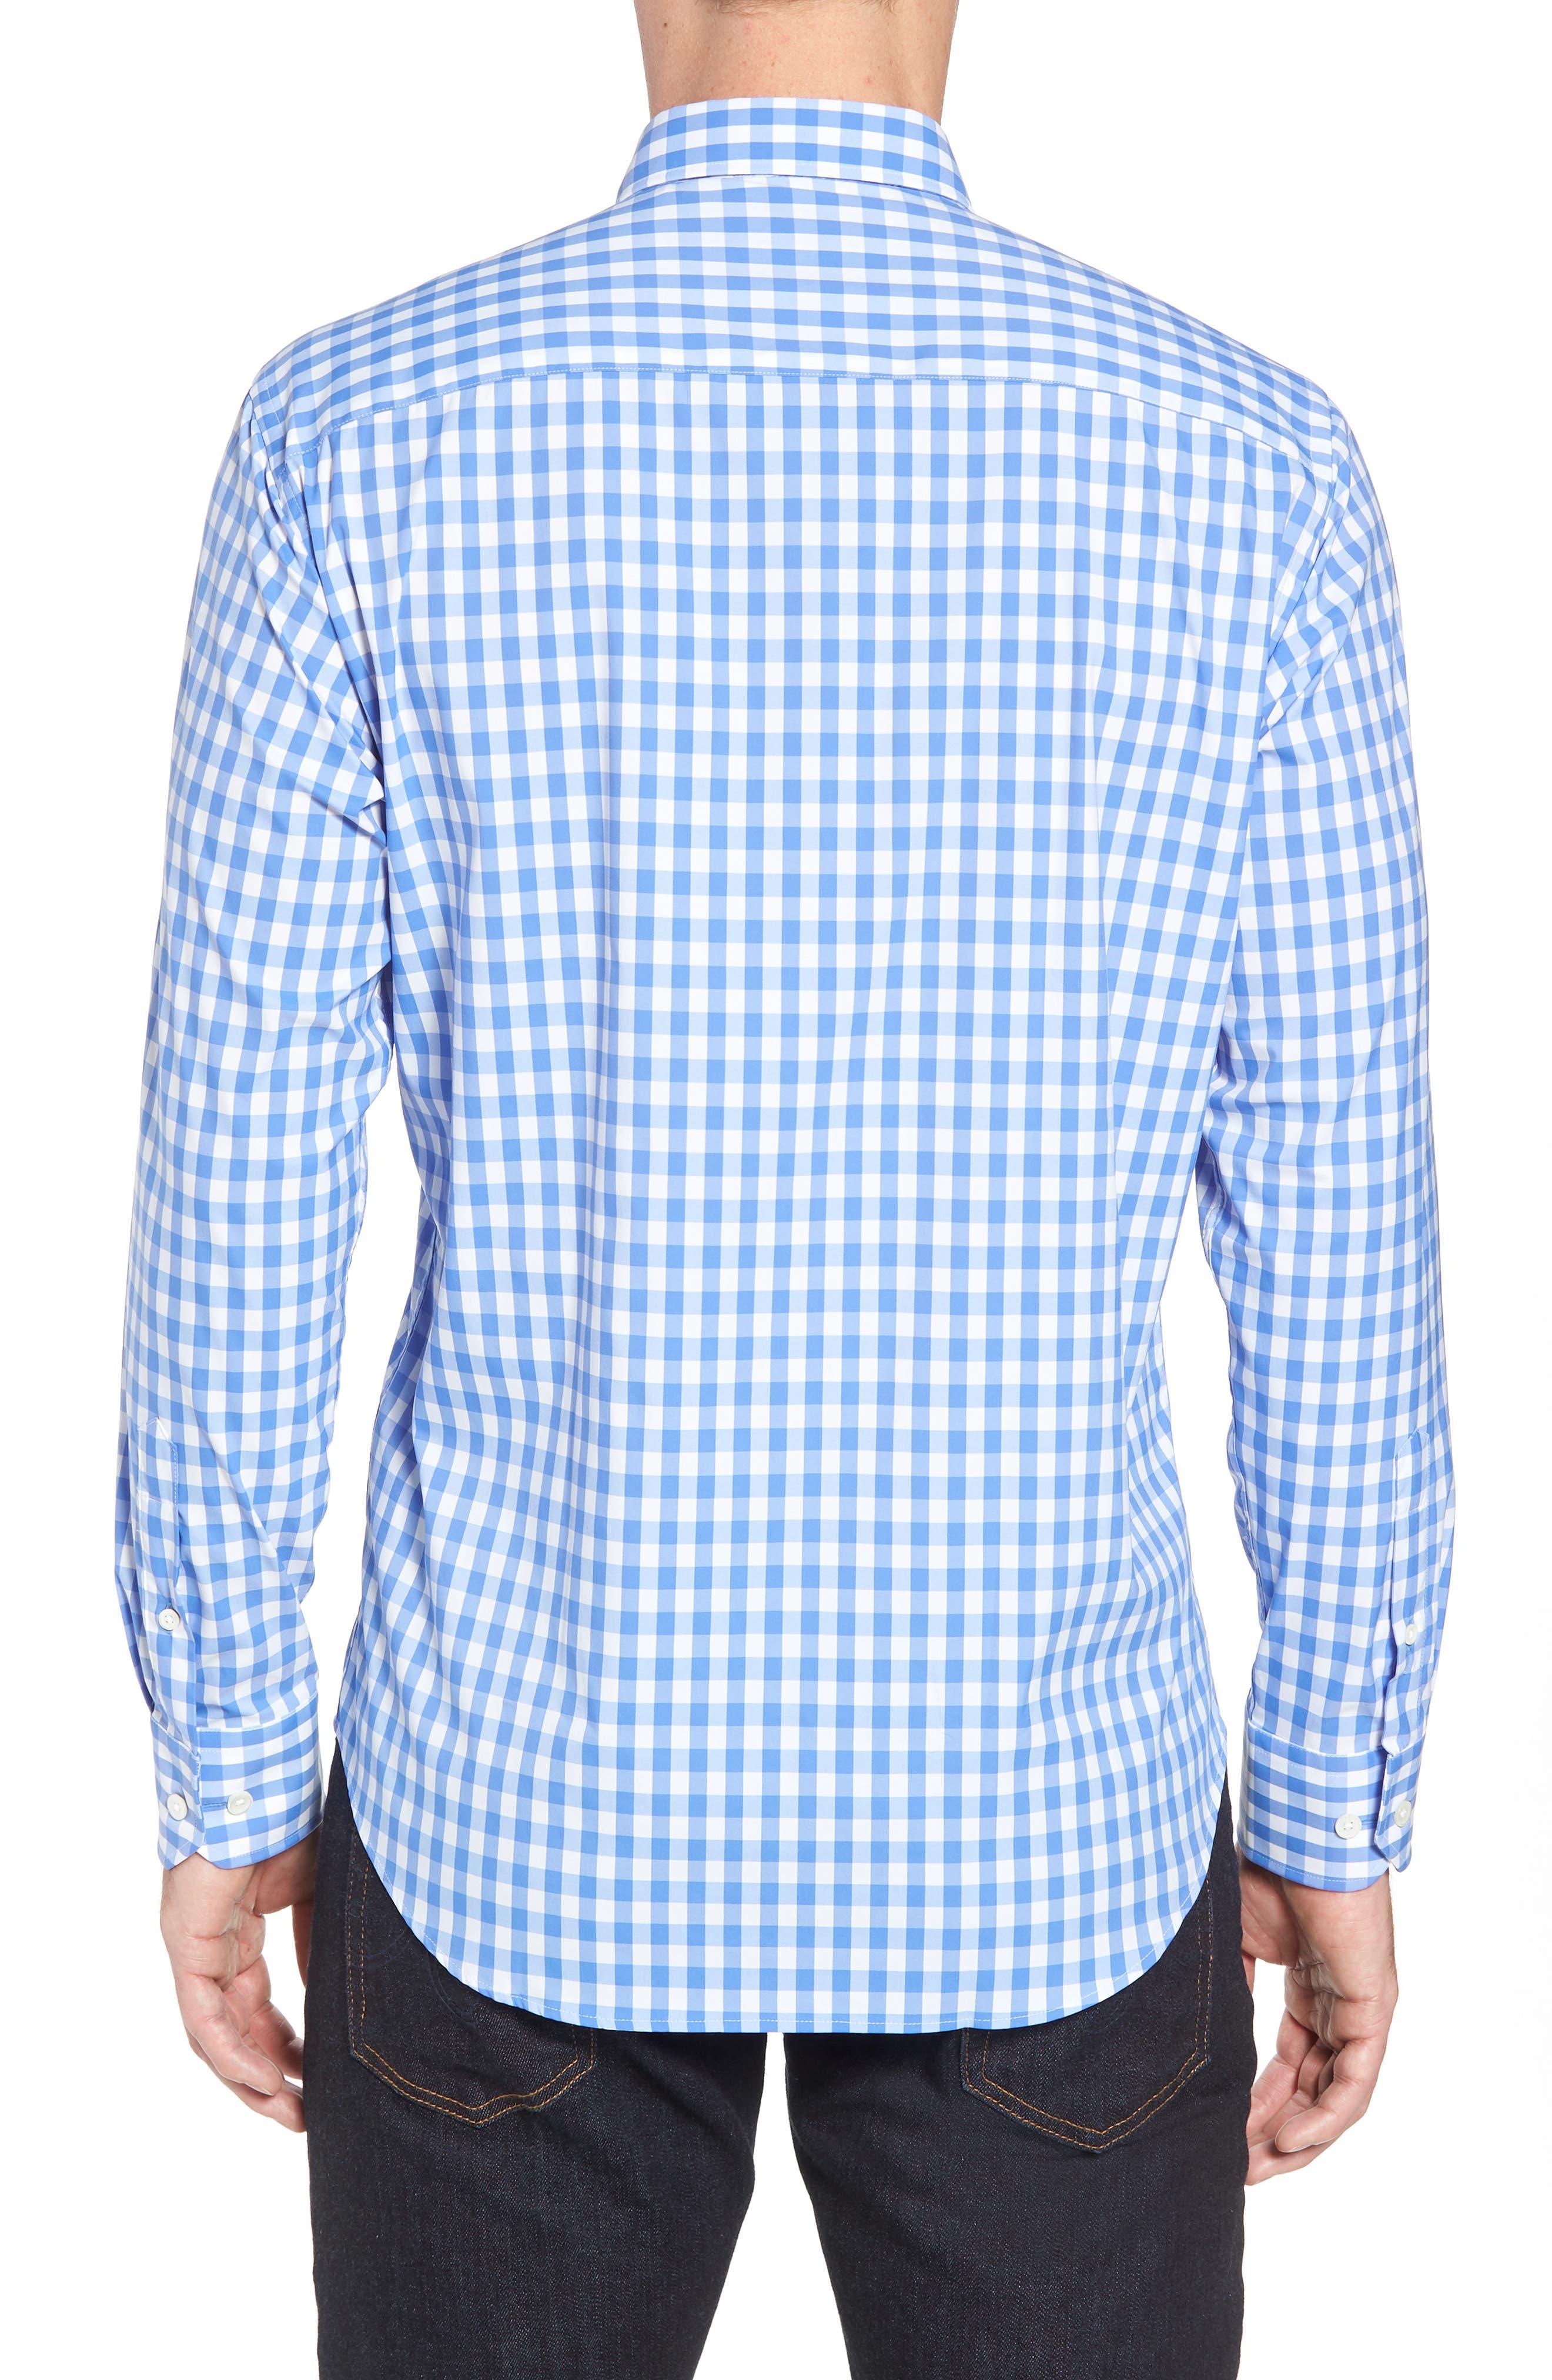 BUGATCHI,                             Shaped Fit Gingham Sport Shirt,                             Alternate thumbnail 2, color,                             422